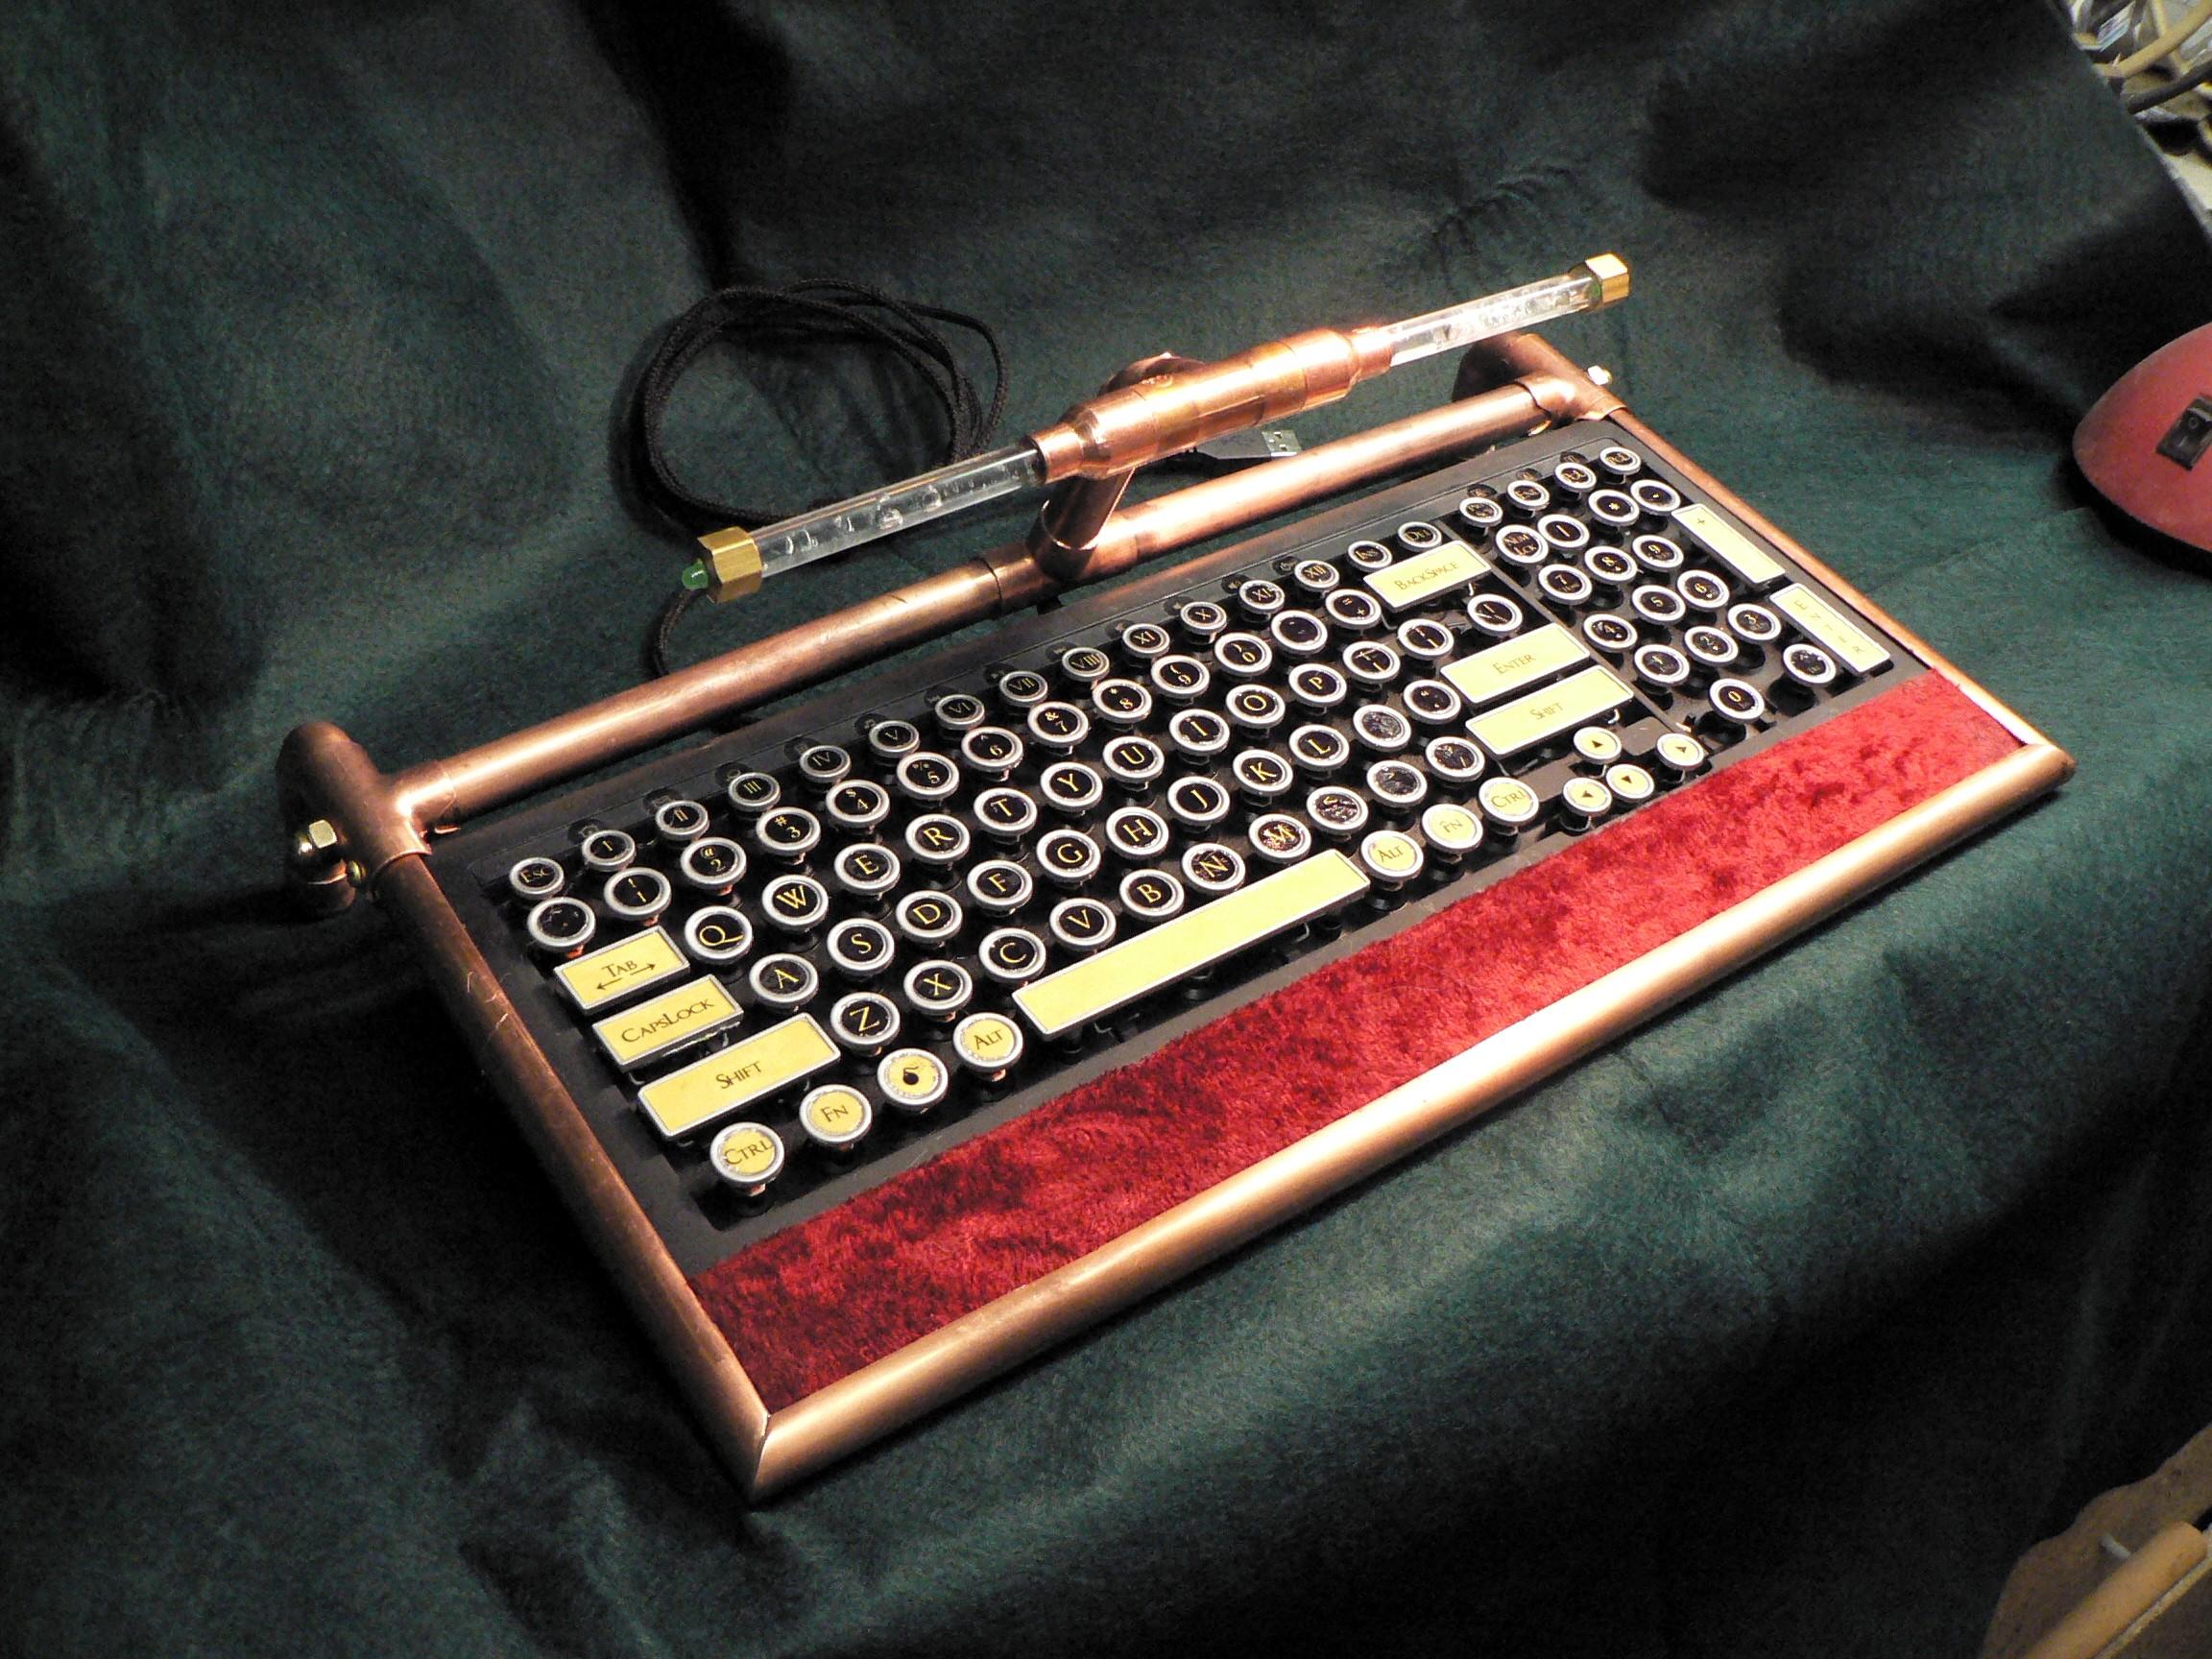 Miss Betsy's Steampunk Keyboard